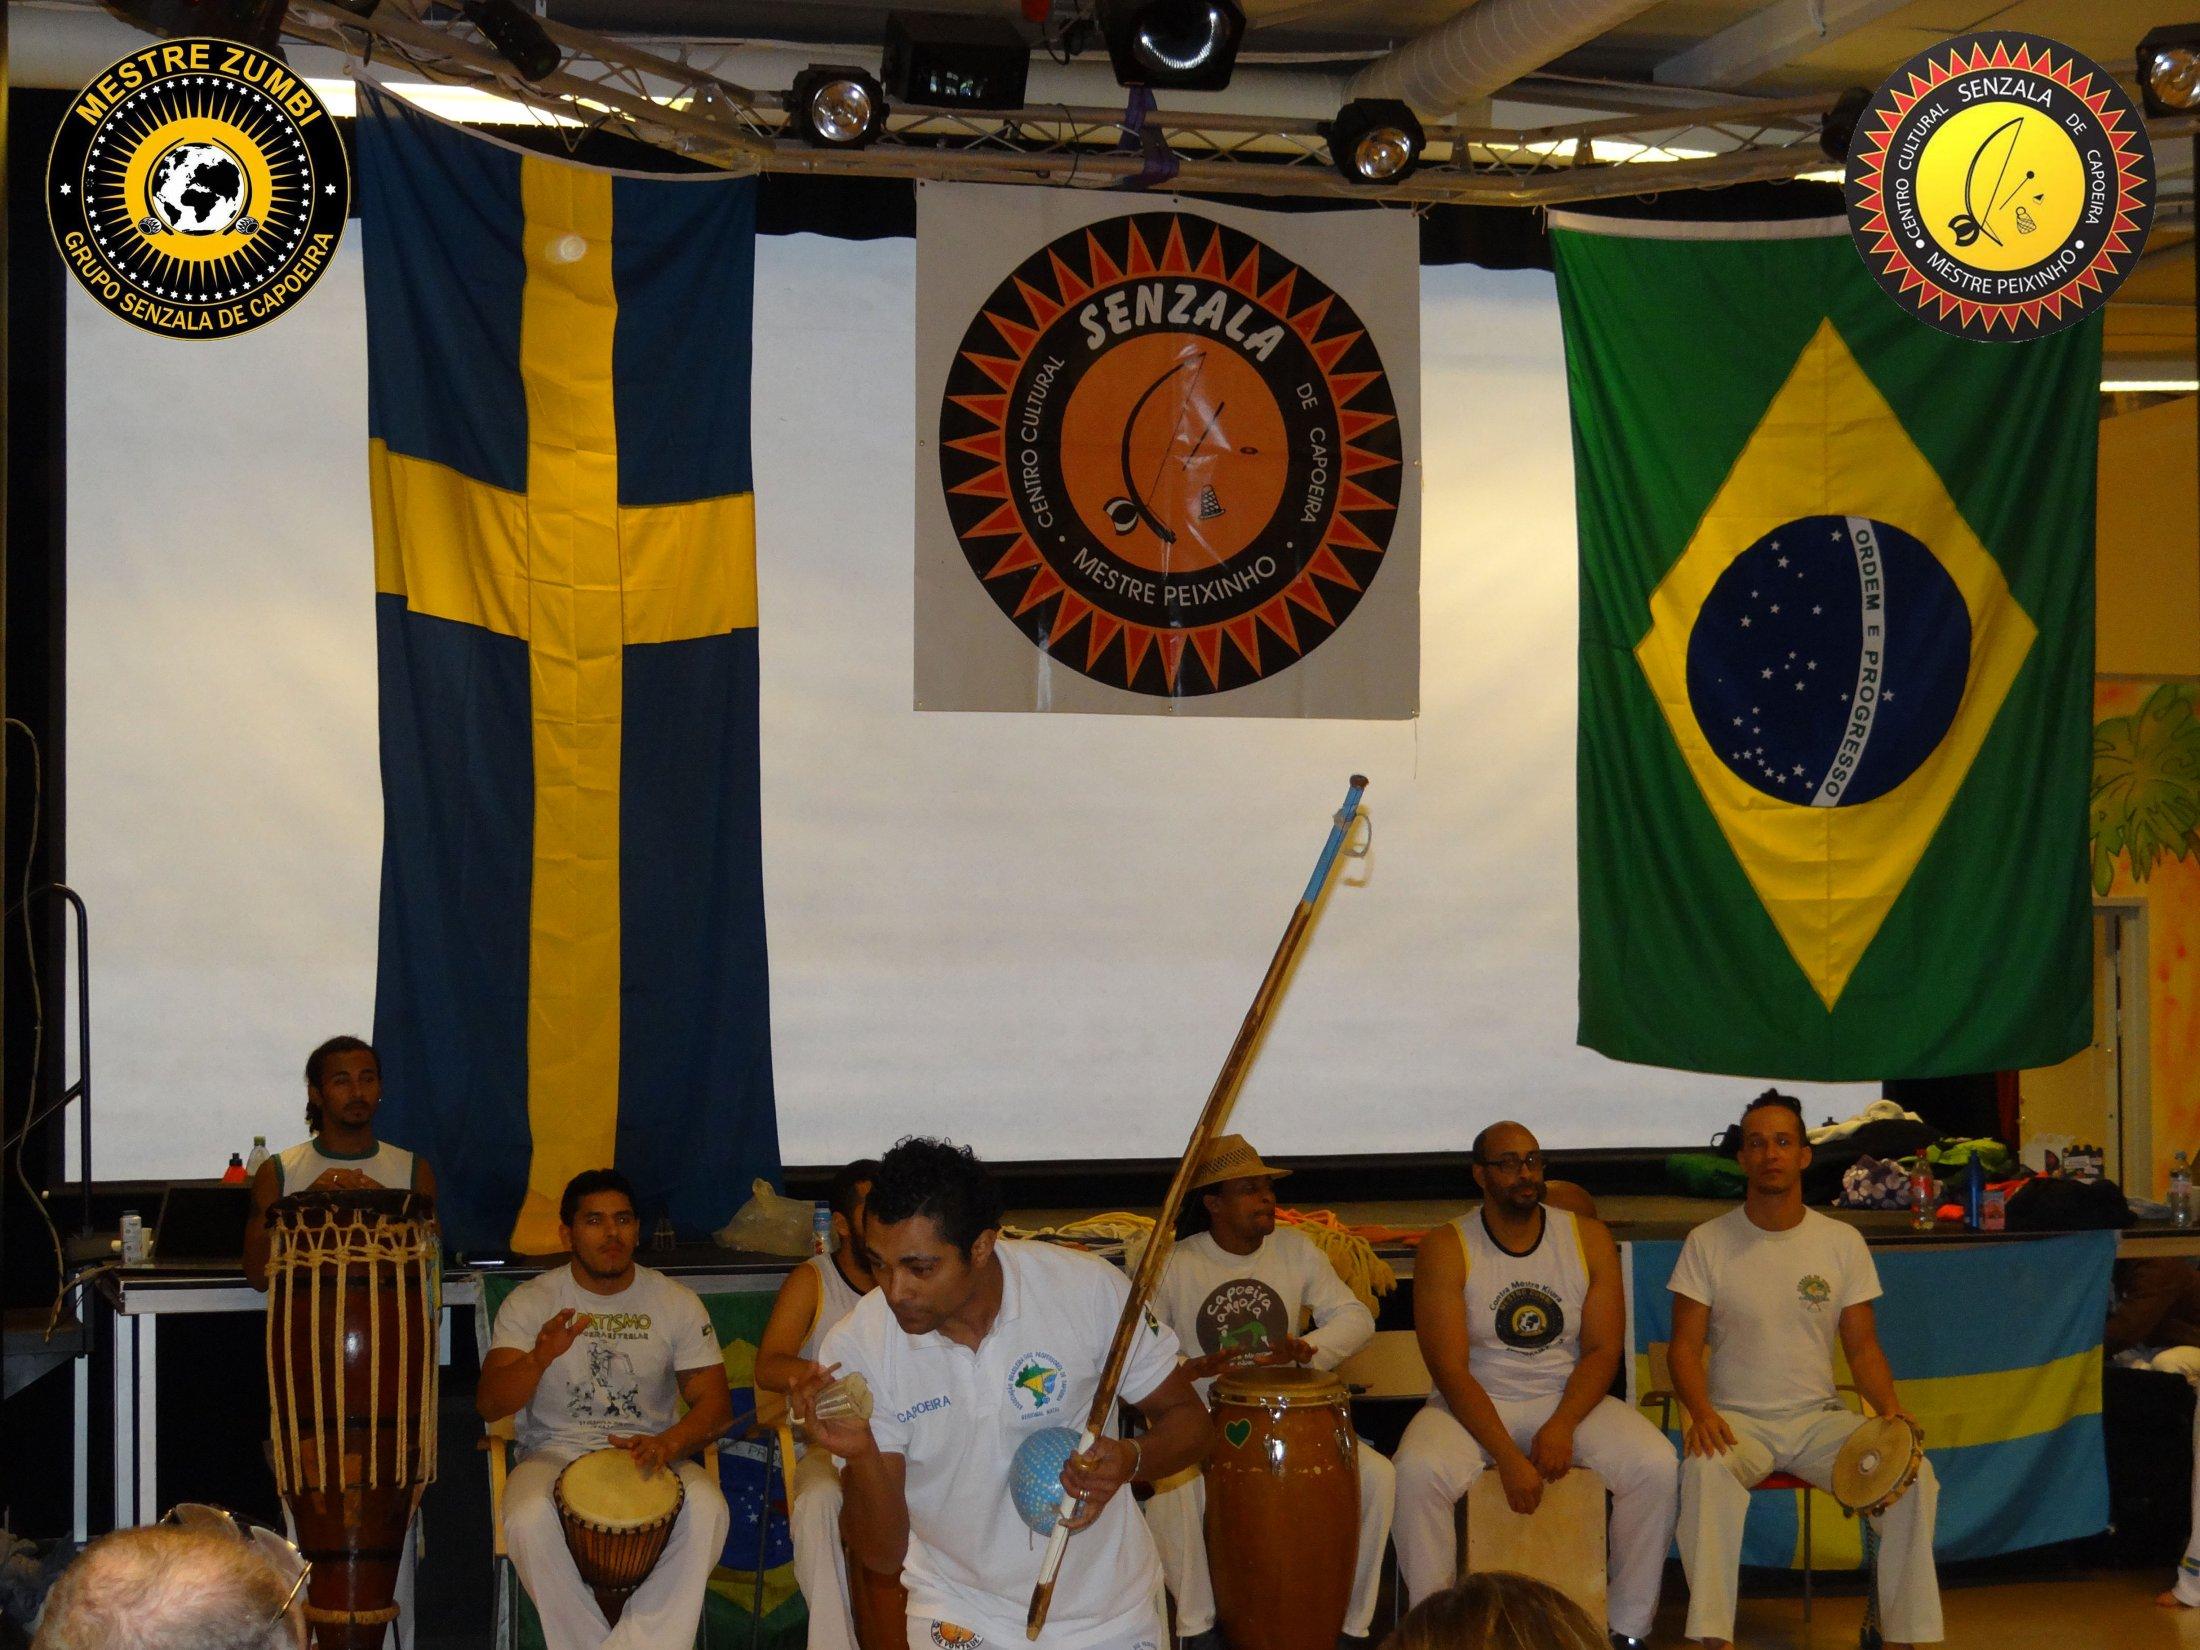 2013-12-14 - Capoeira 029